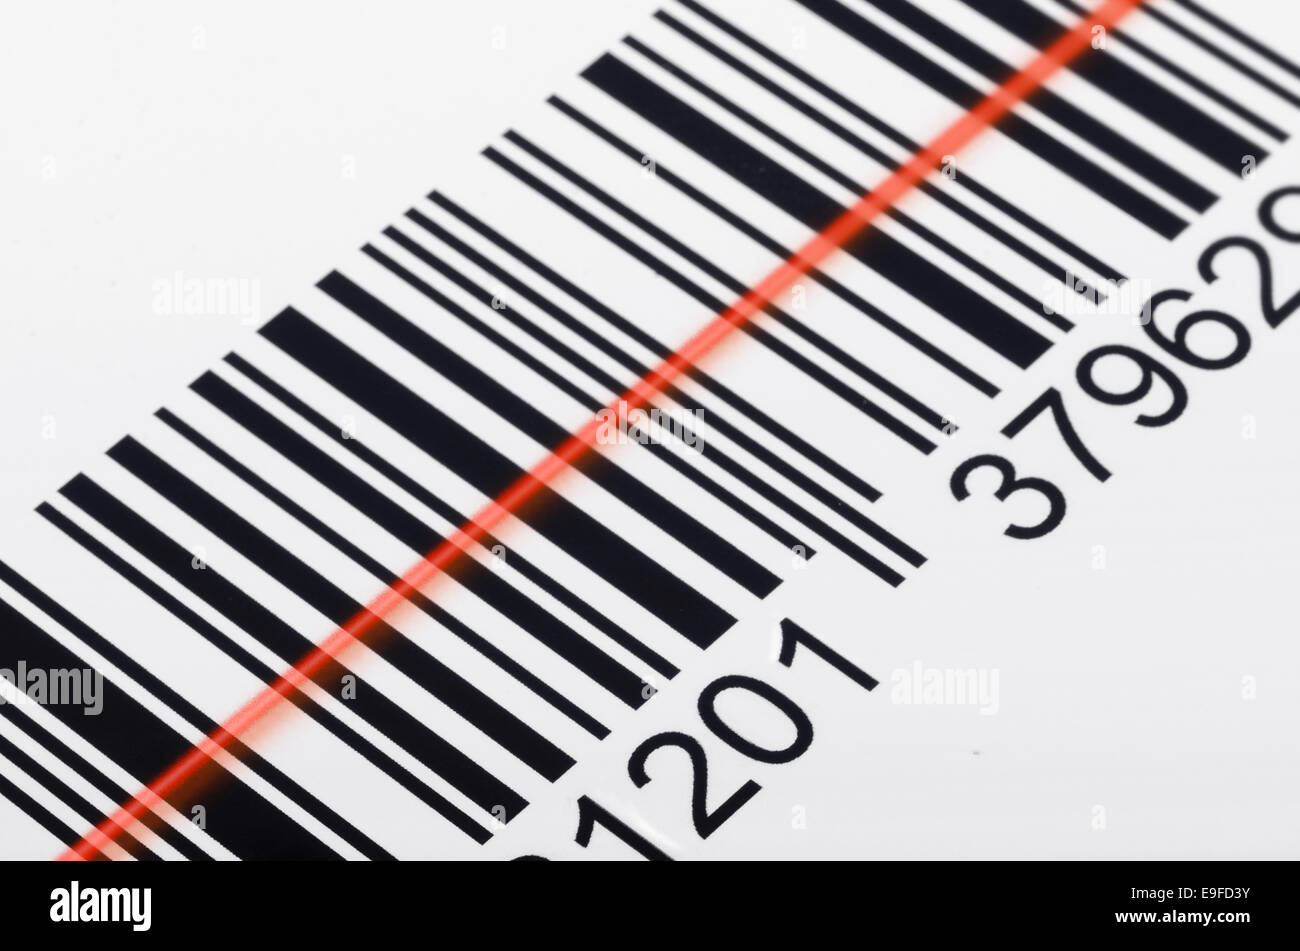 Scanning barcode - Stock Image